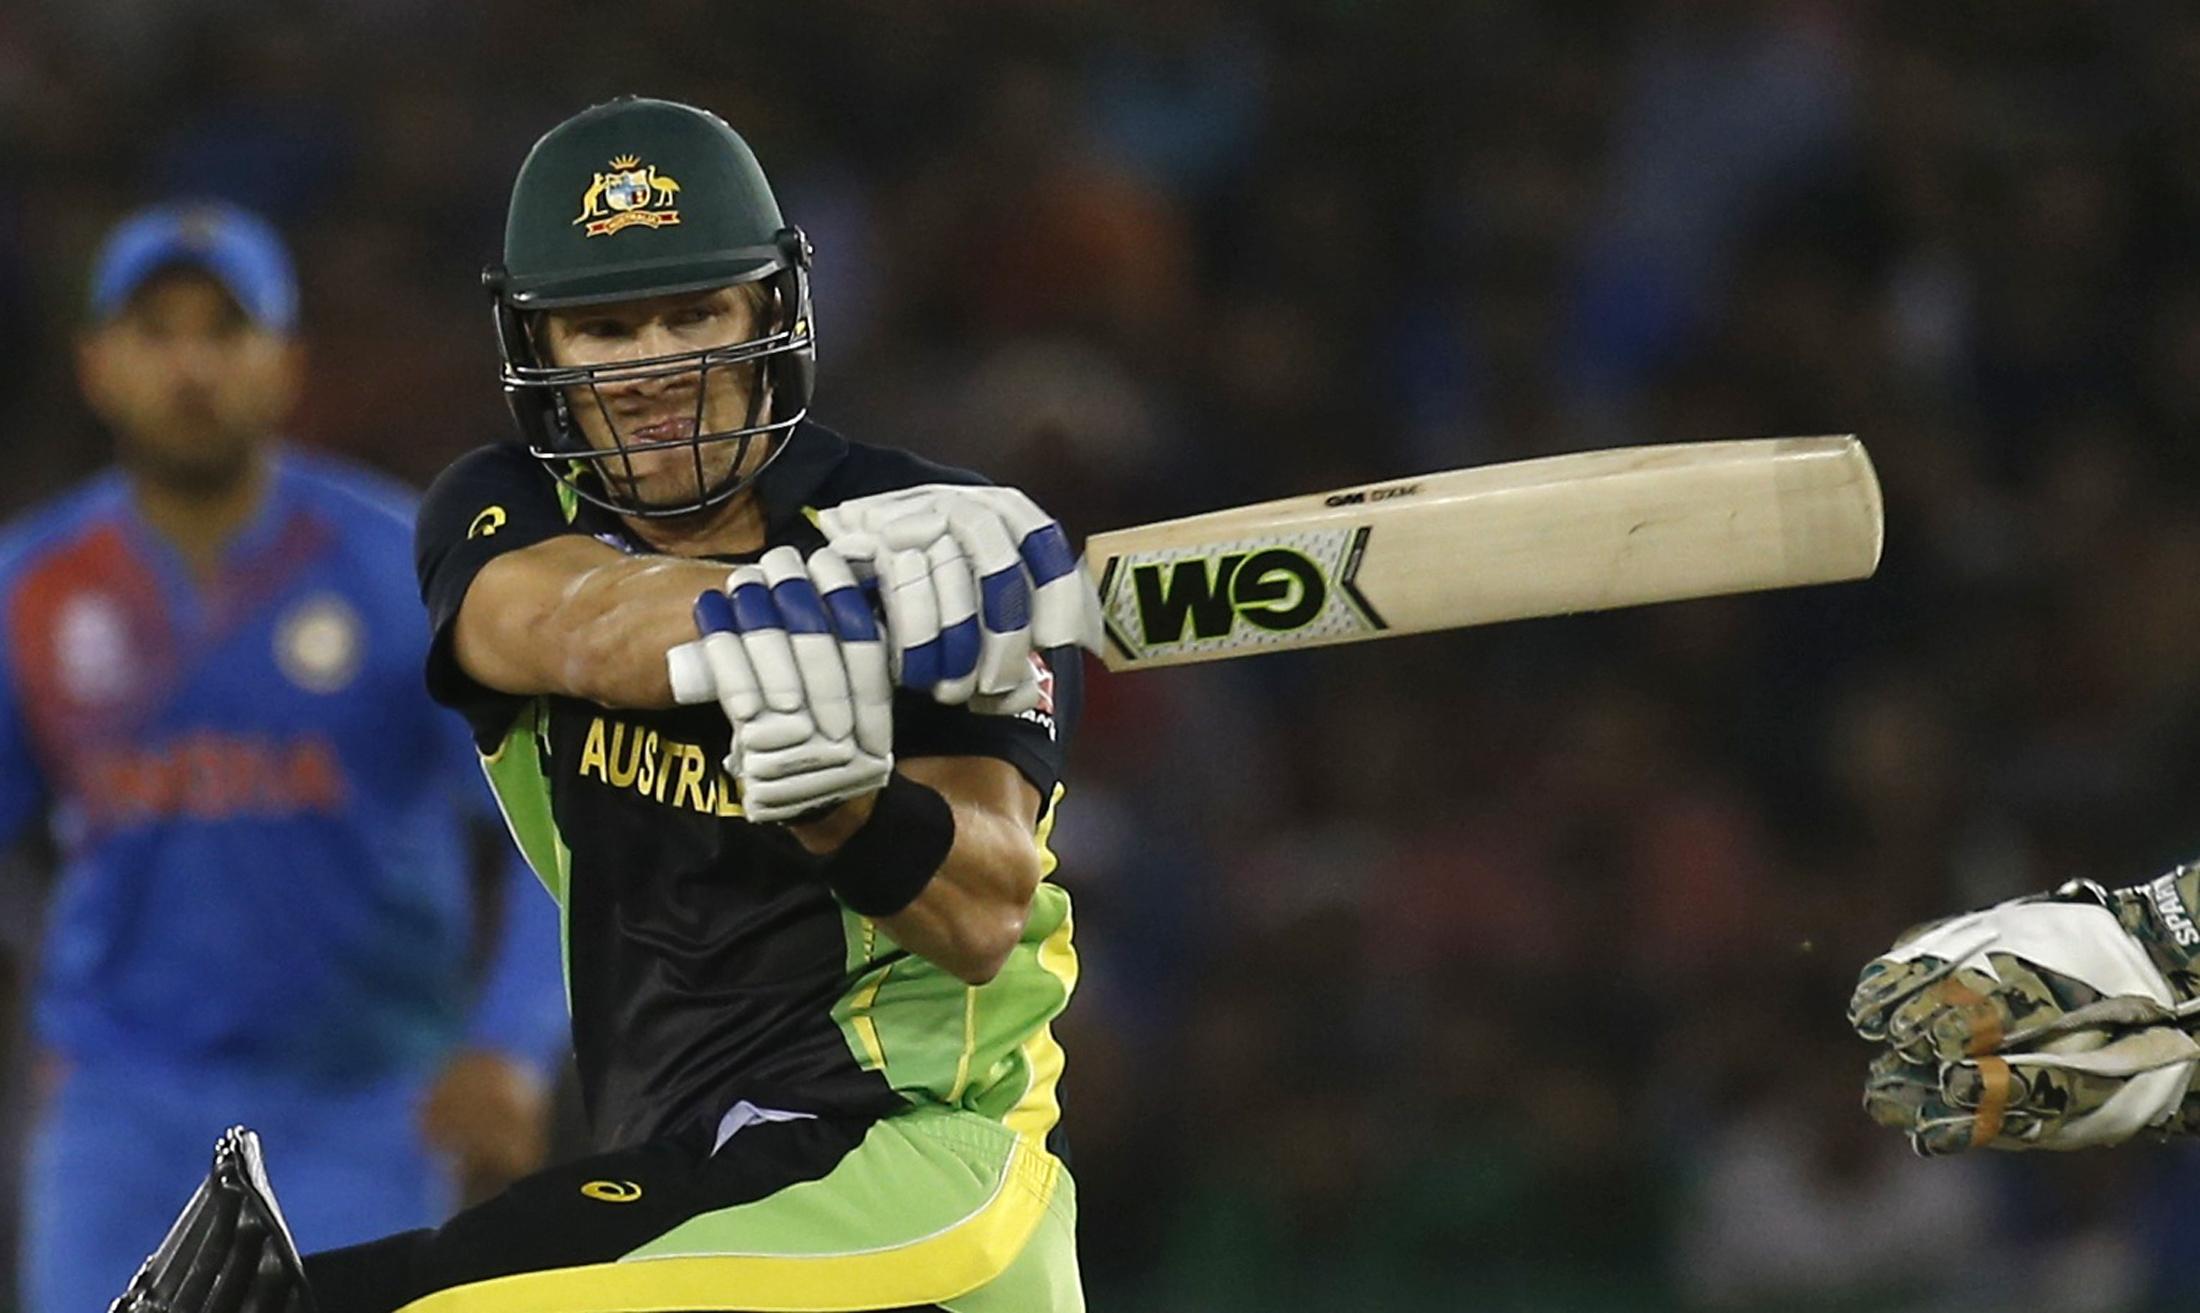 FILE PHOTO: Cricket - India v Australia - World Twenty20 cricket tournament - Mohali, India - 27/03/2016. Australia's Shane Watson plays a shot. REUTERS/Adnan Abidi